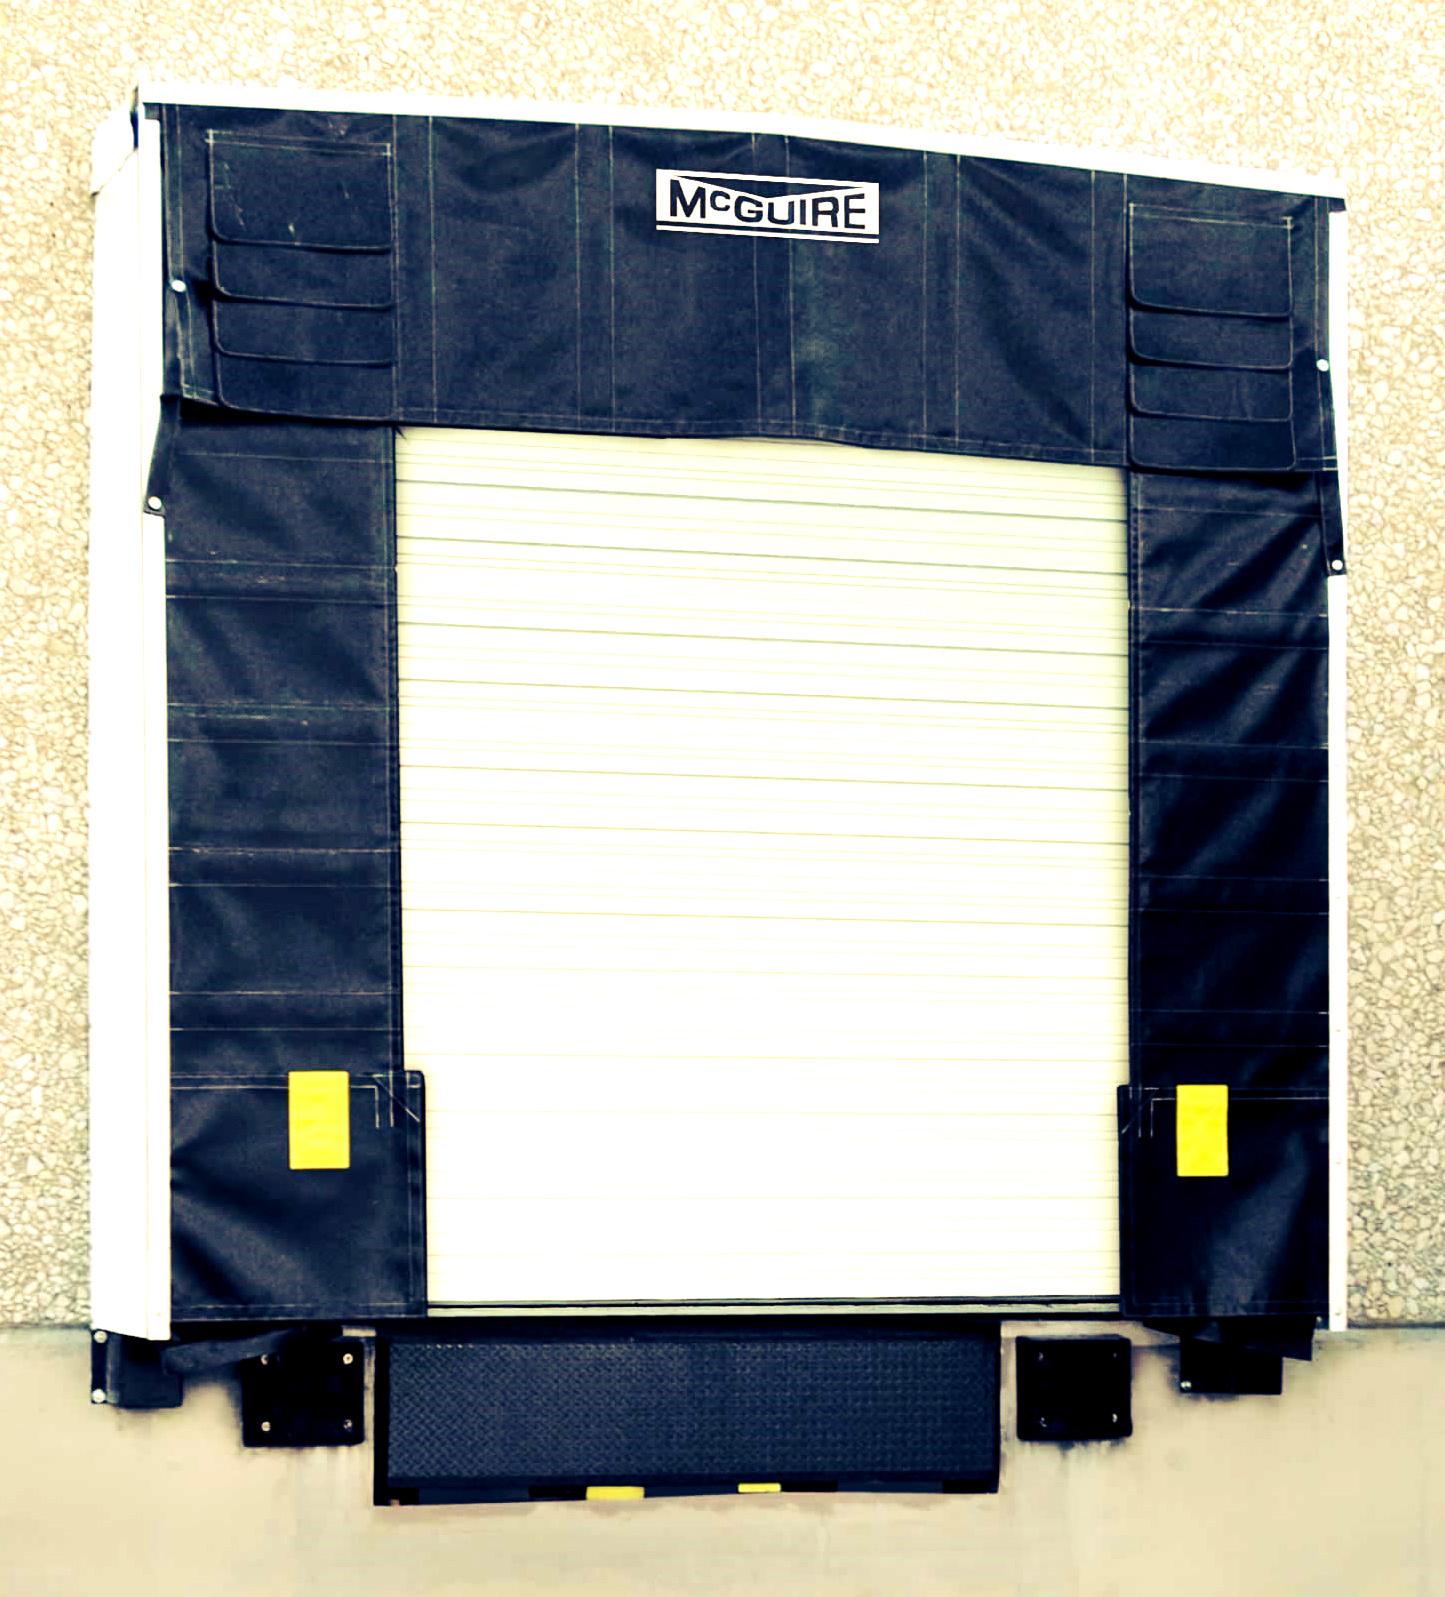 Dock Shelter McGuire TC300